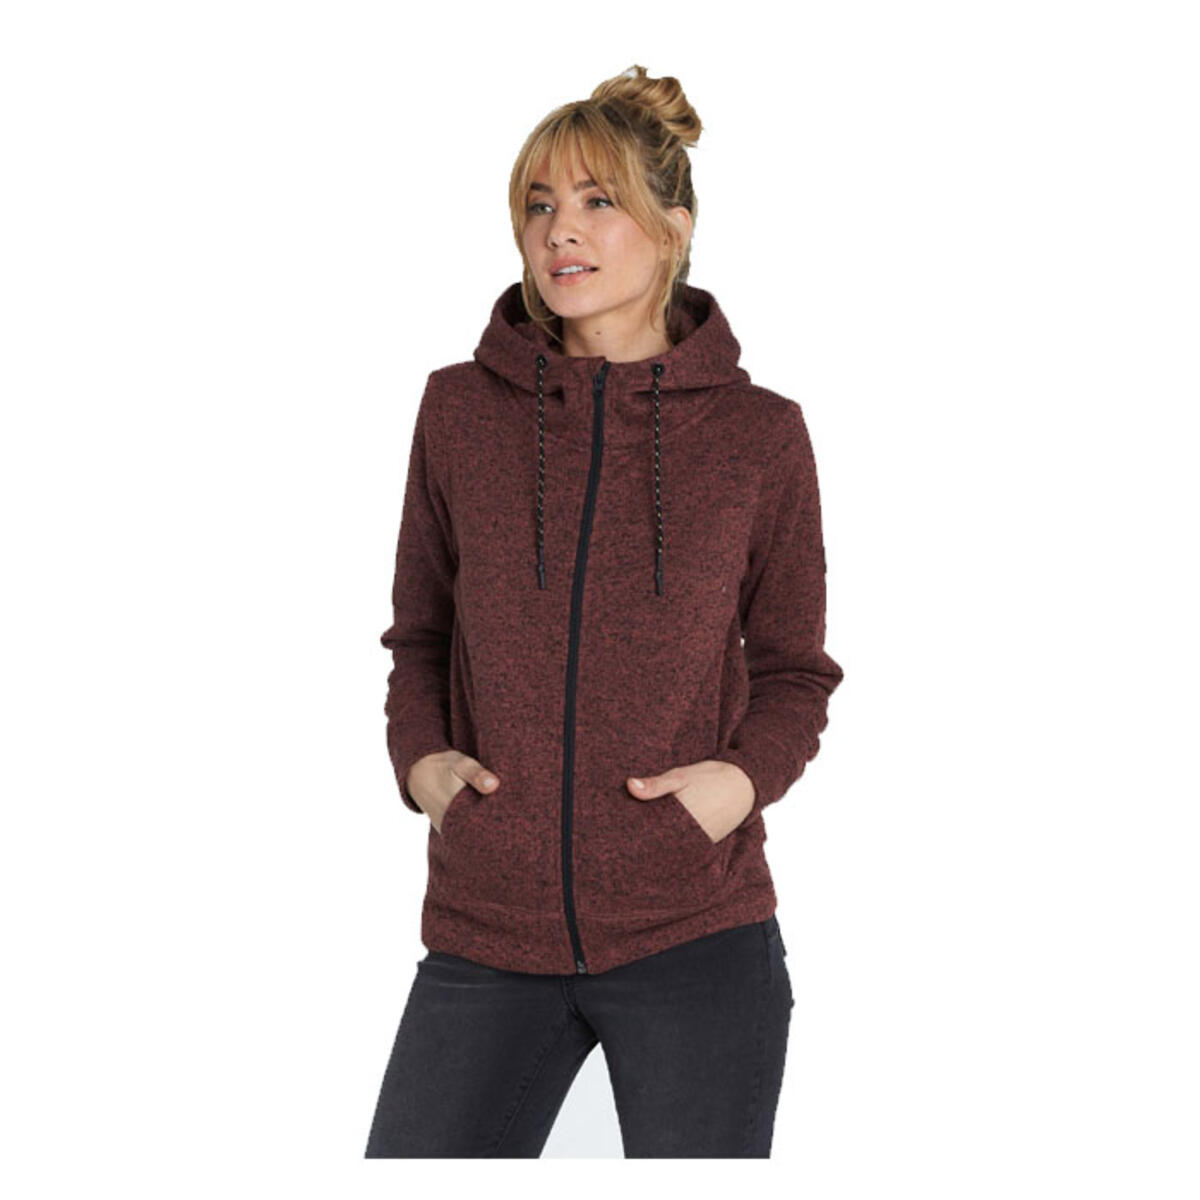 Billabong Women S Boundary Full Zip Hooded Fleece Winter